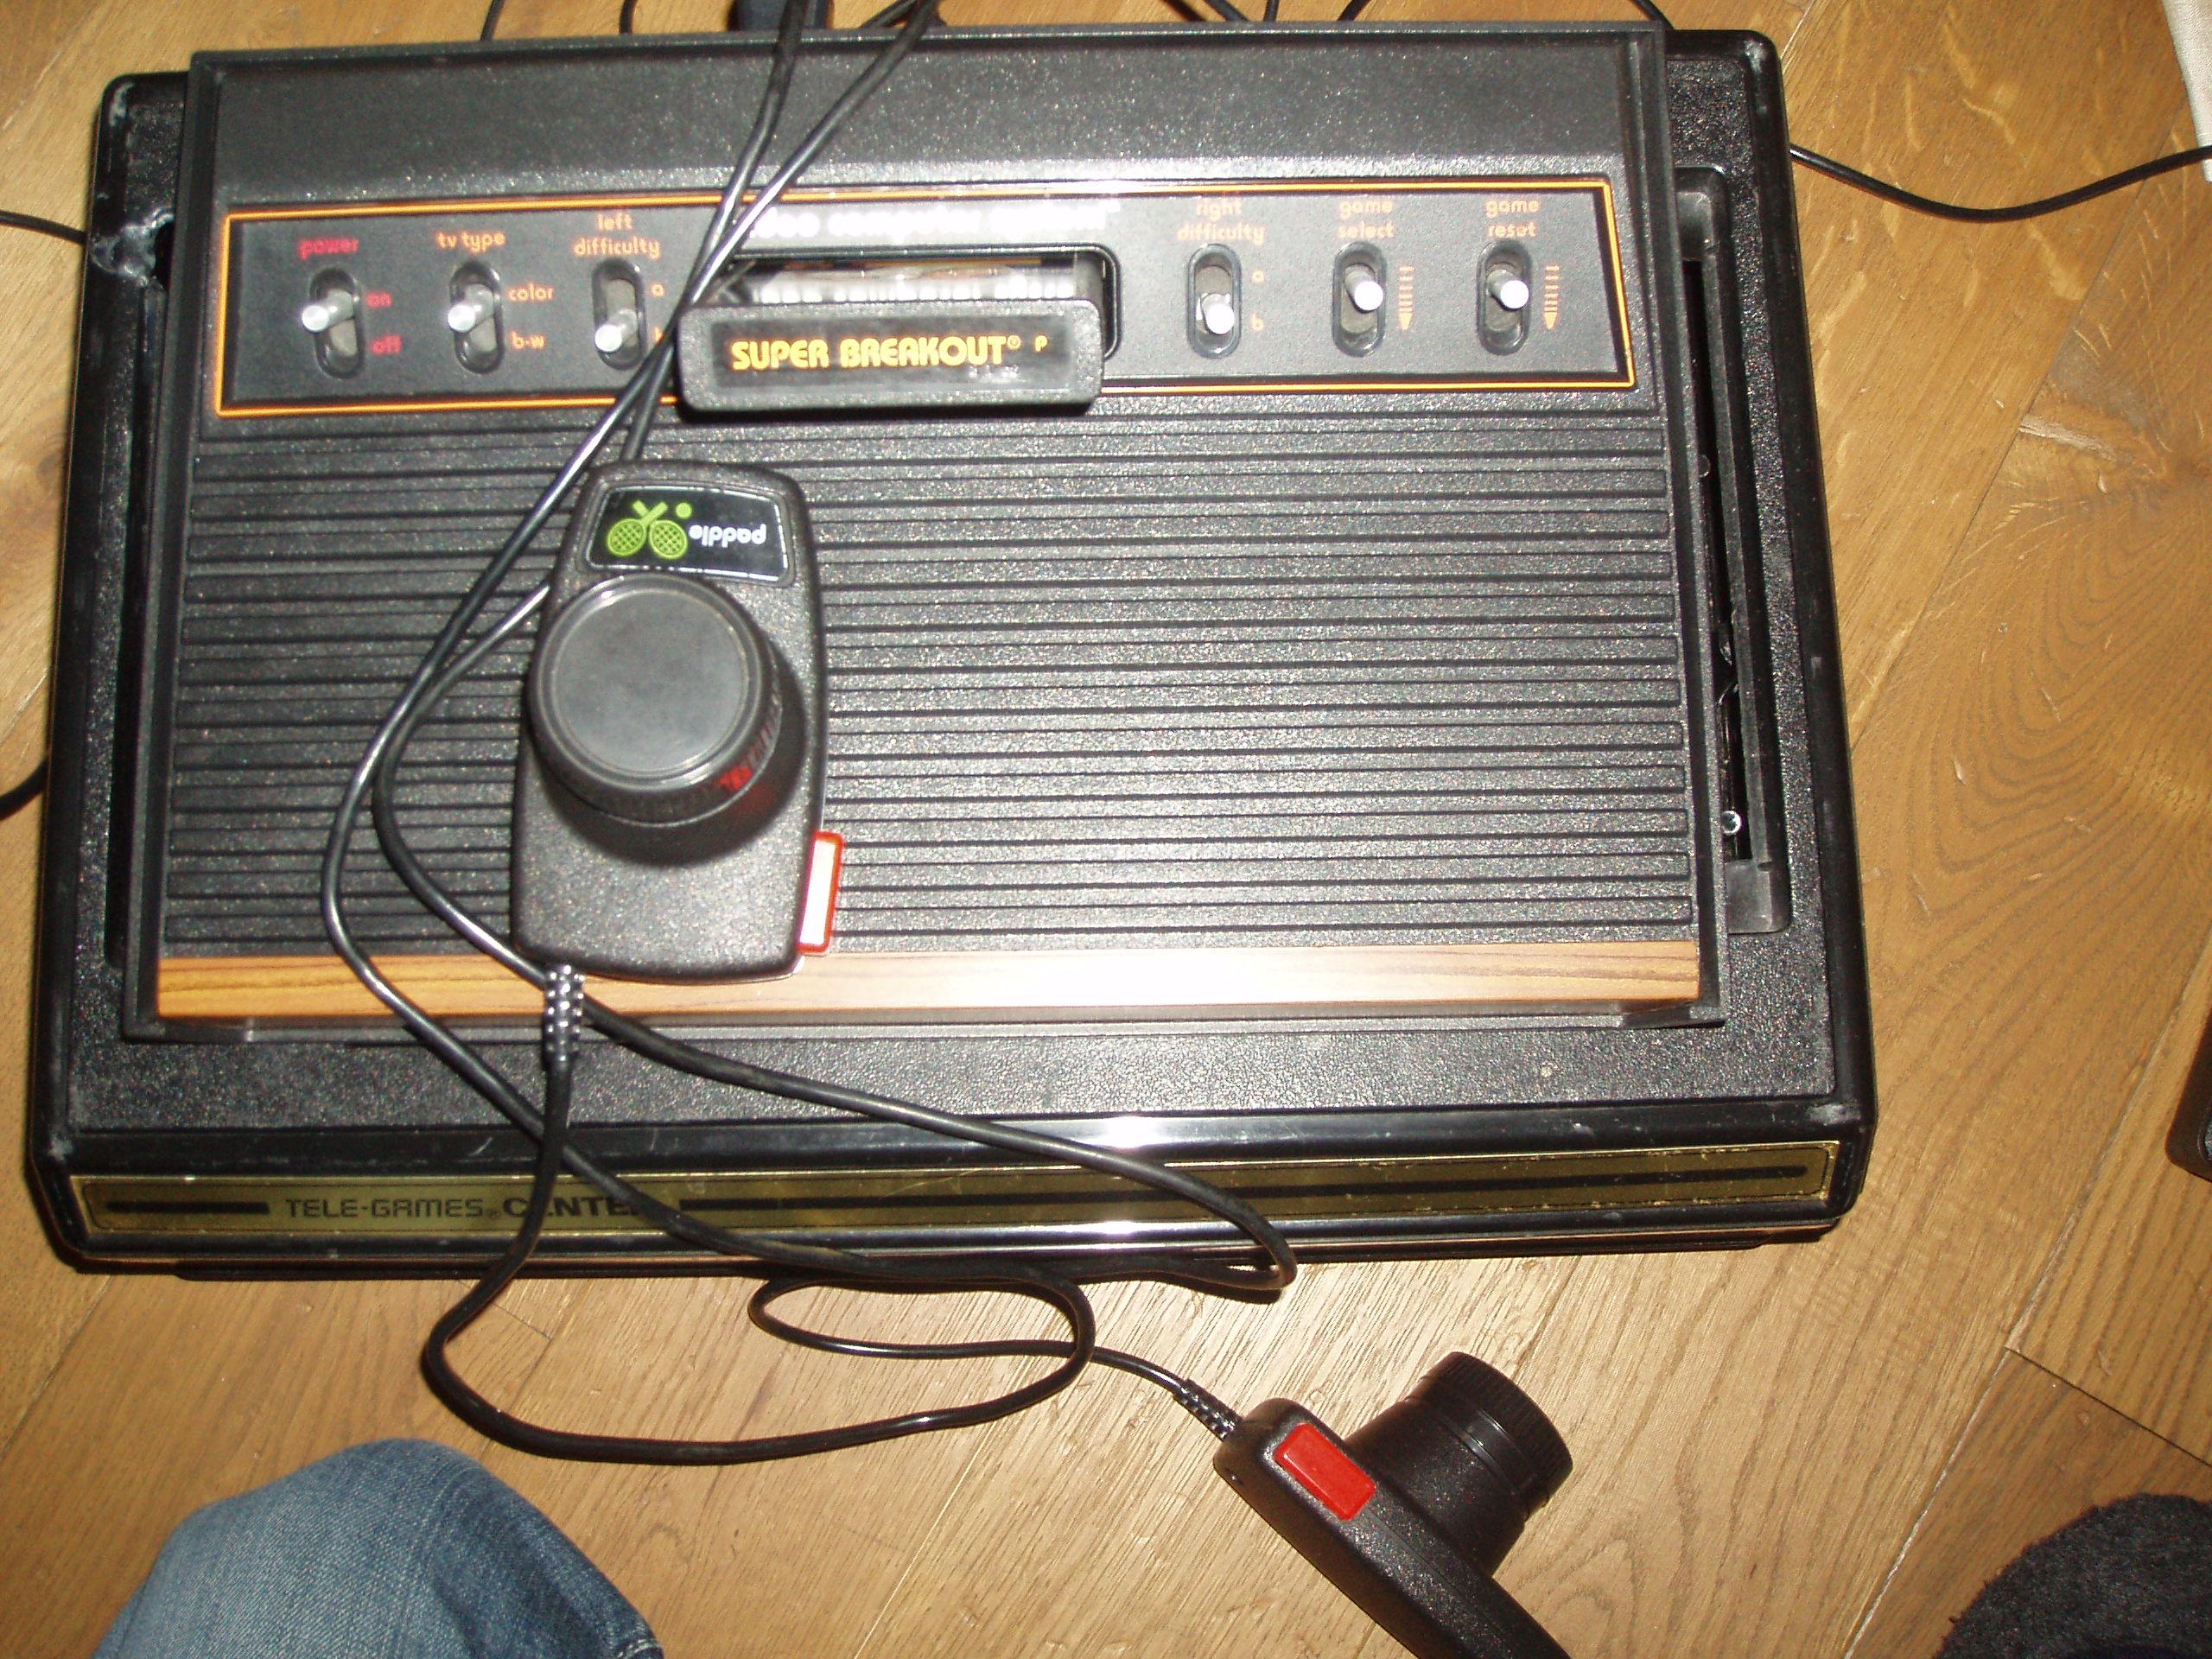 atari2600forever: Super Breakout (Atari 2600 Novice/B) 413 points on 2018-04-23 03:16:54